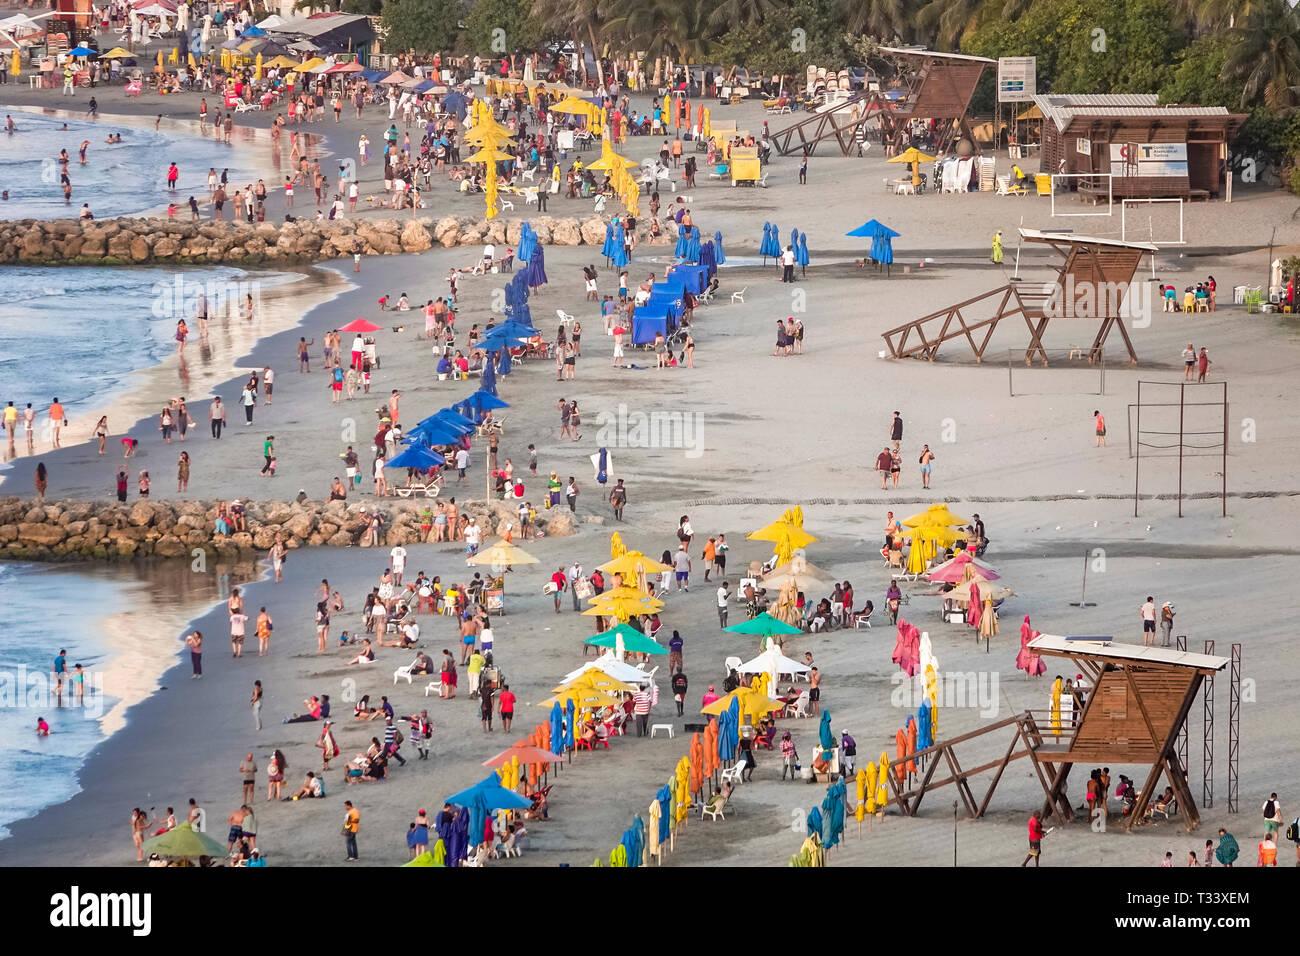 Colombie, Cartagena, Bocagrande, mer des Caraïbes plage publique, eau de sable, location de parapluies, hispanique Hispaniques latino Latino Latino Latino Llatino ethnies immi Banque D'Images